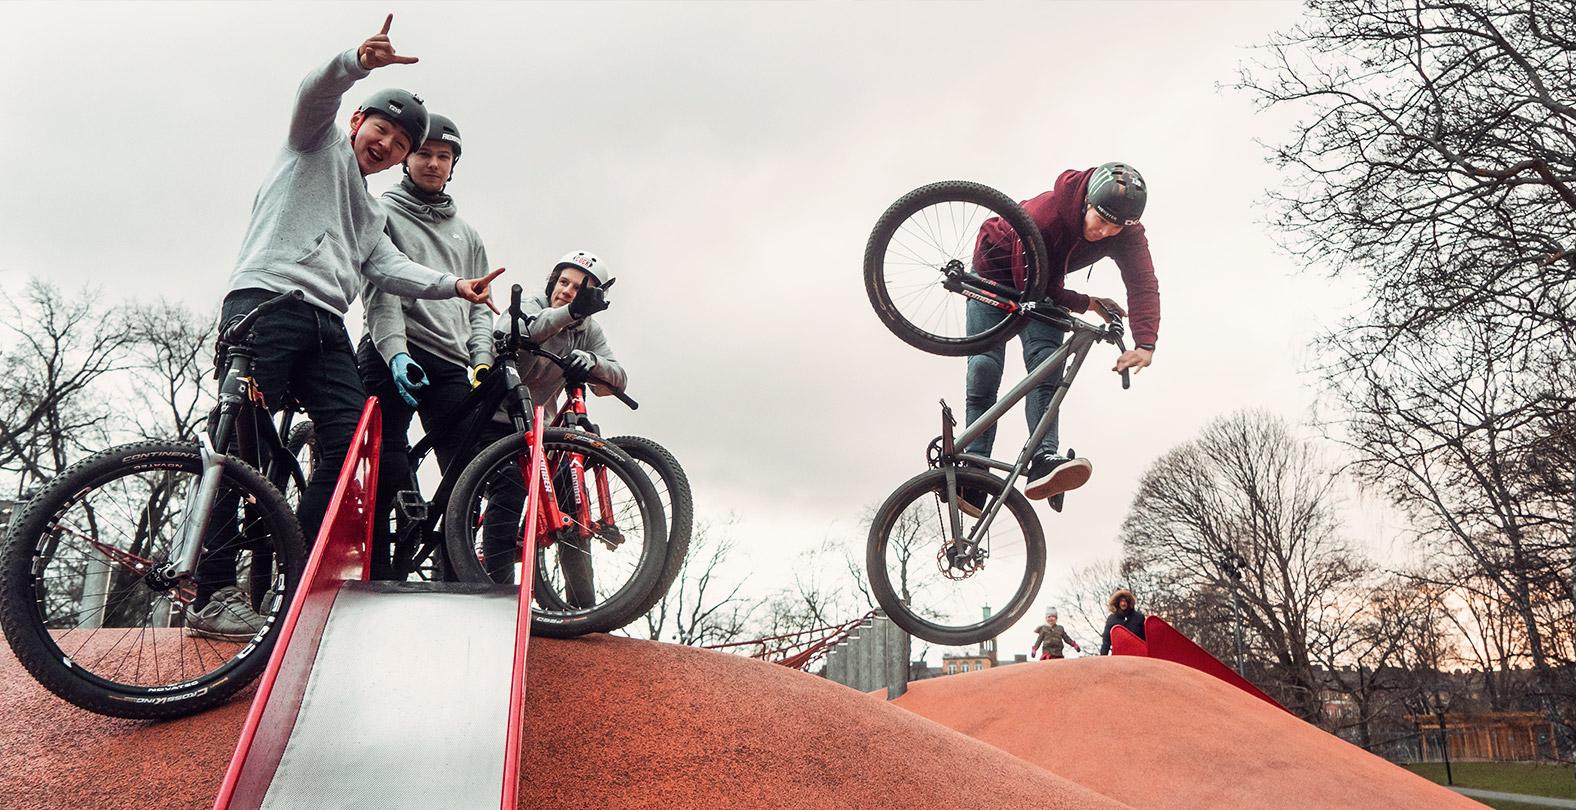 Max Fredriksson Mountain biker and friends